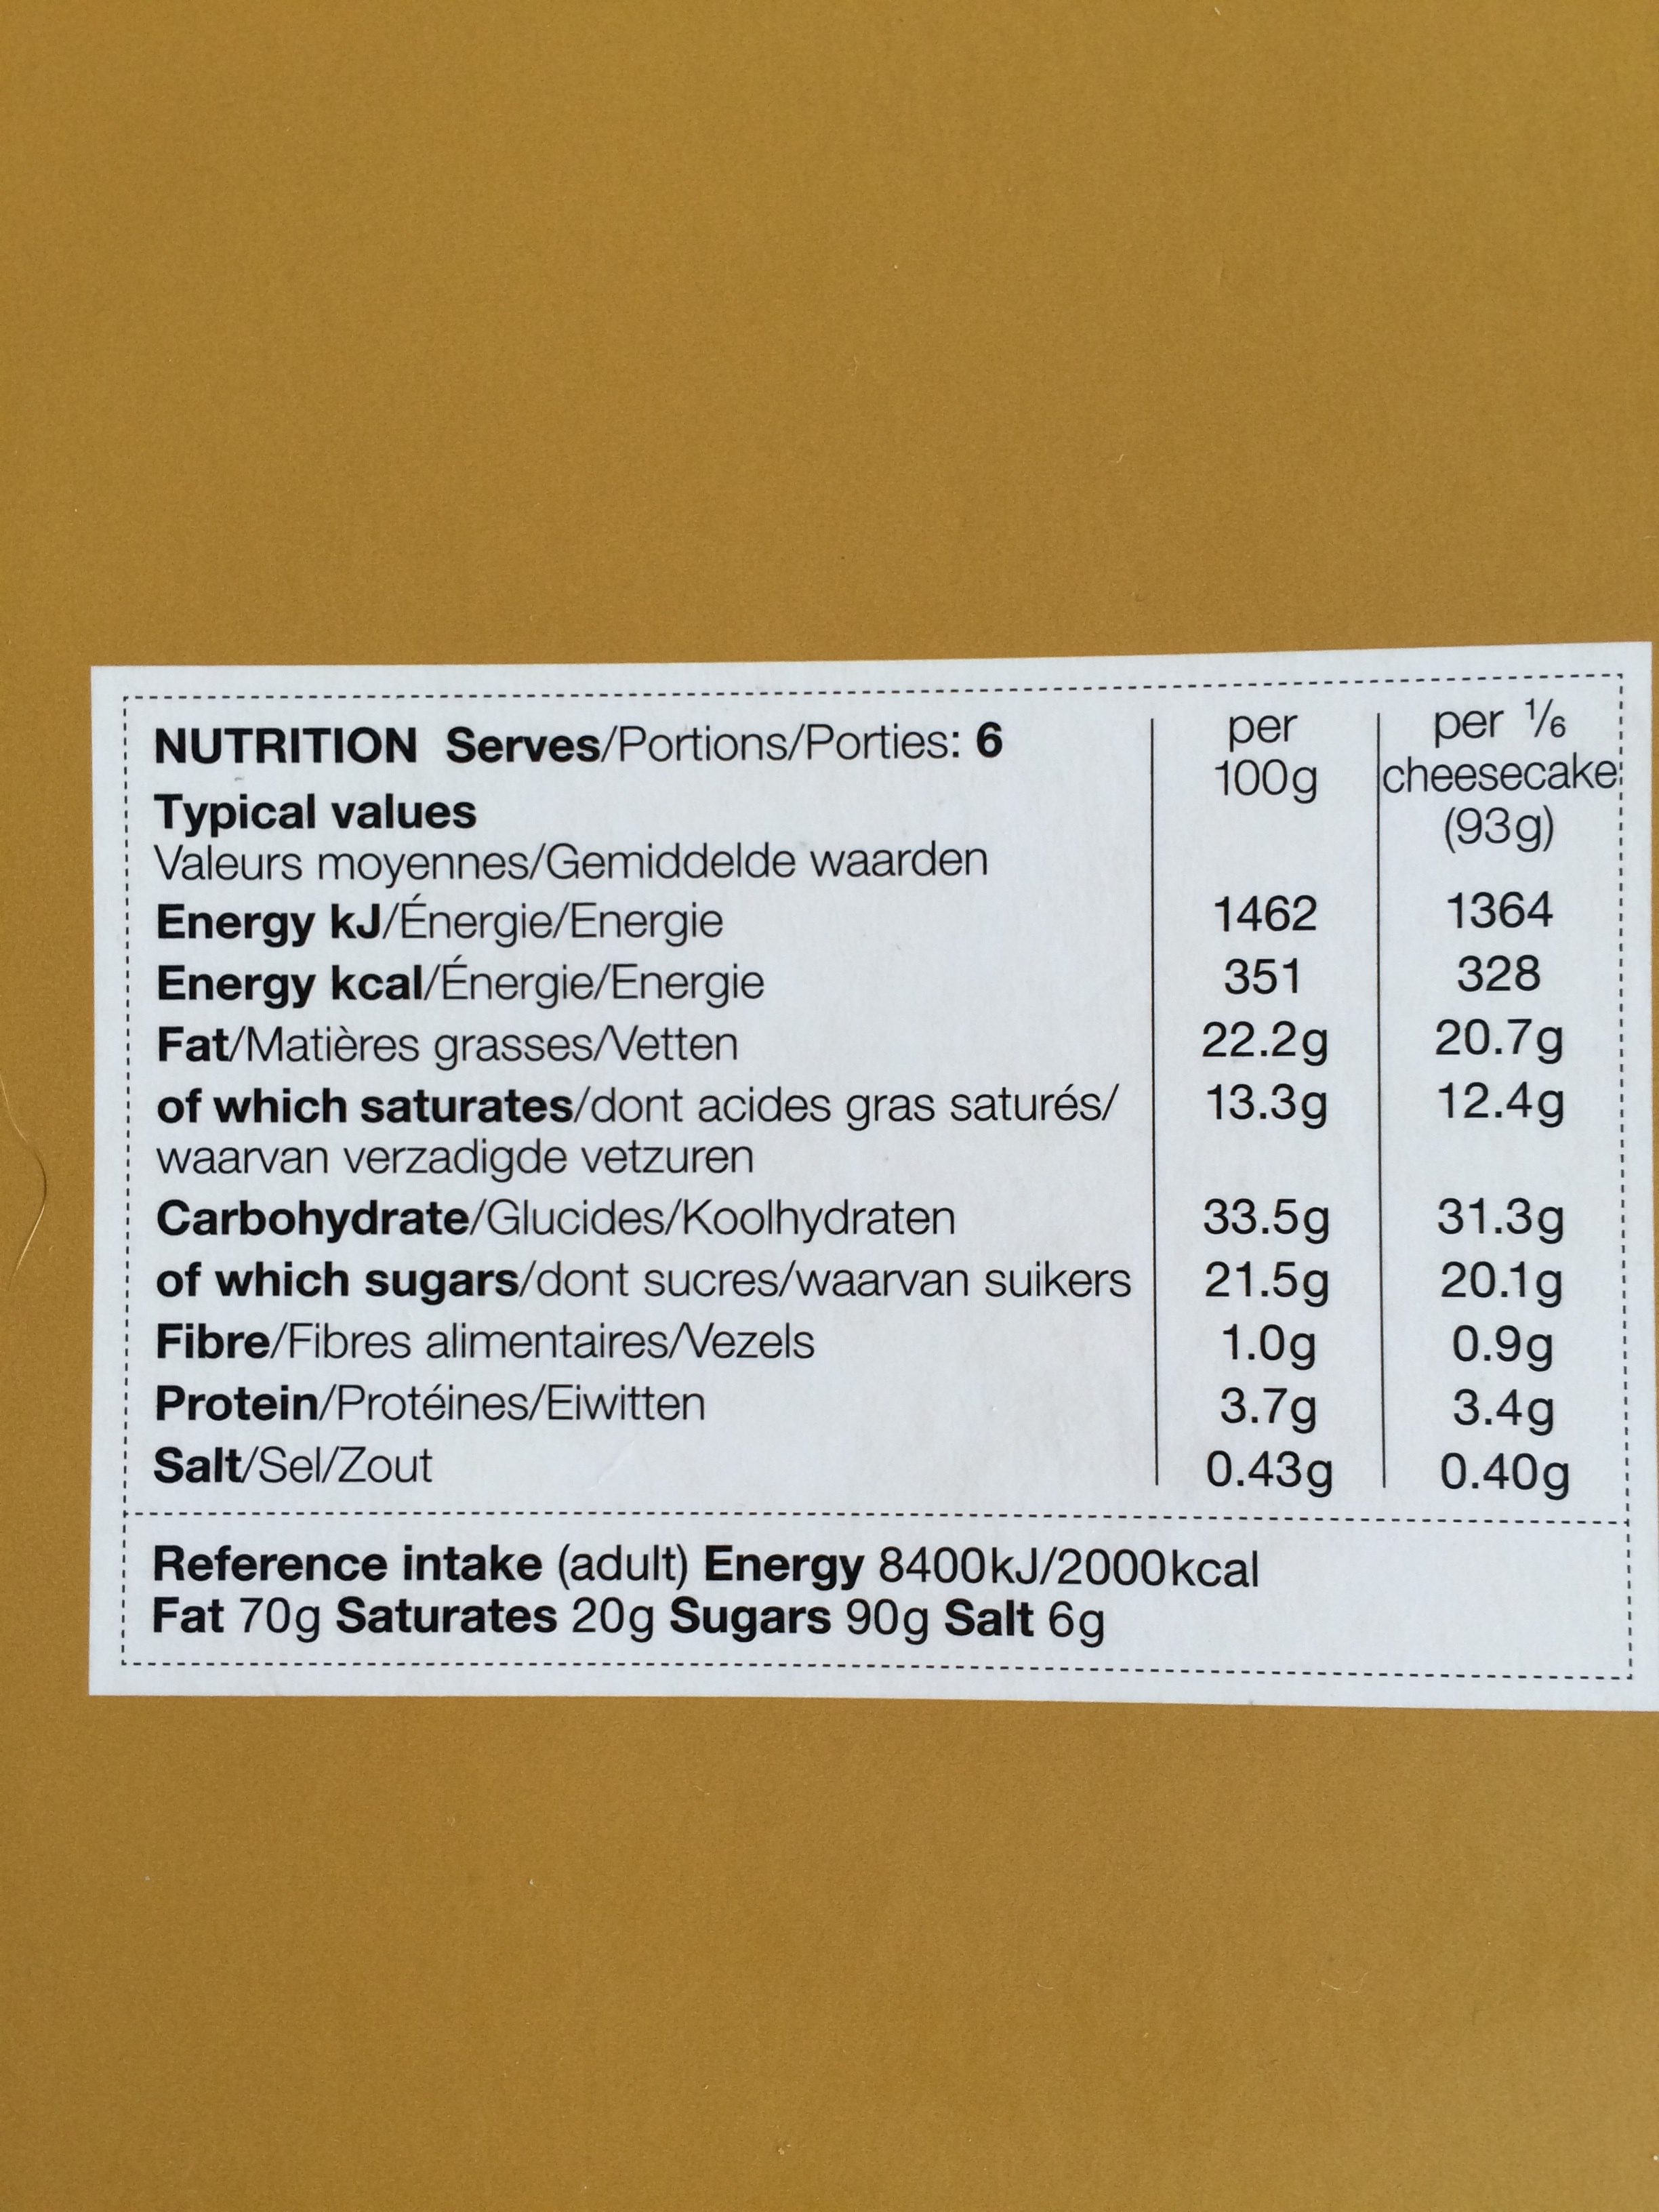 Salted Caramel Cheesecake - Ingredients - fr